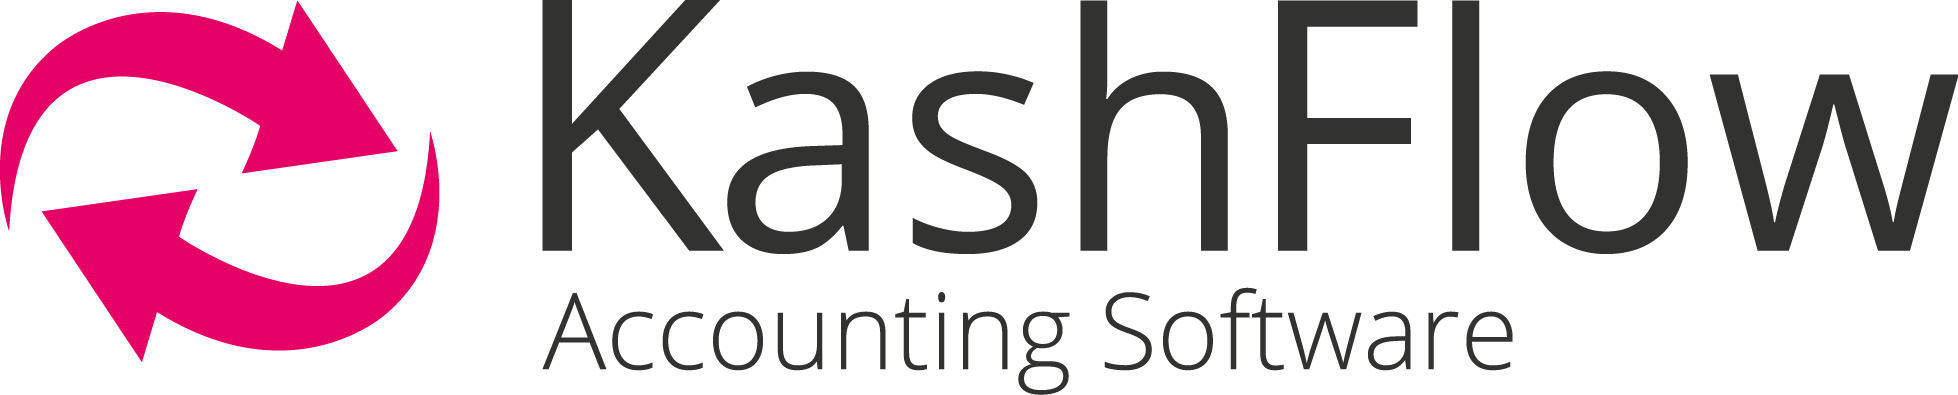 KashFlow_logo